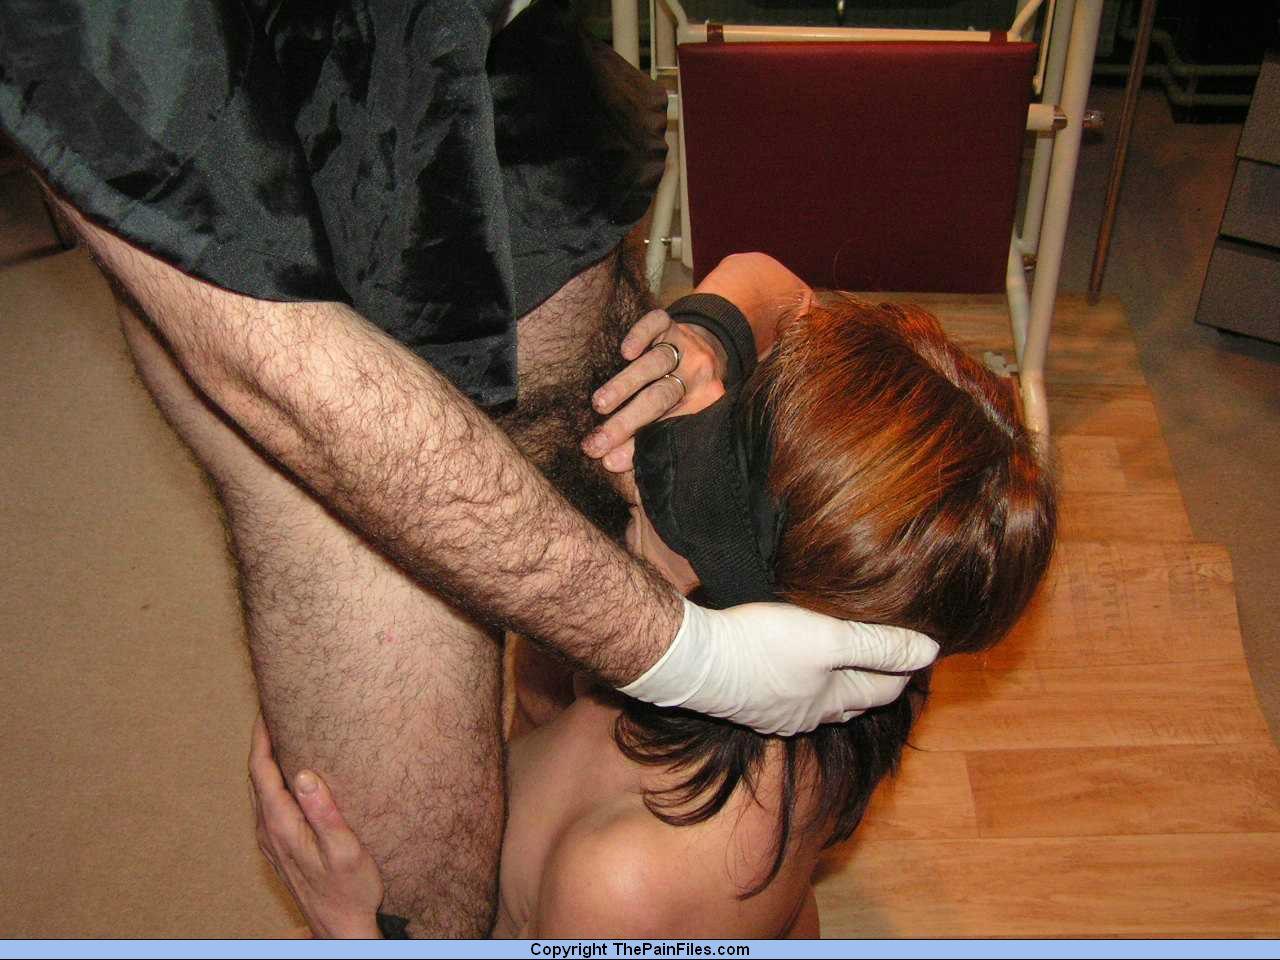 violent sexual torture